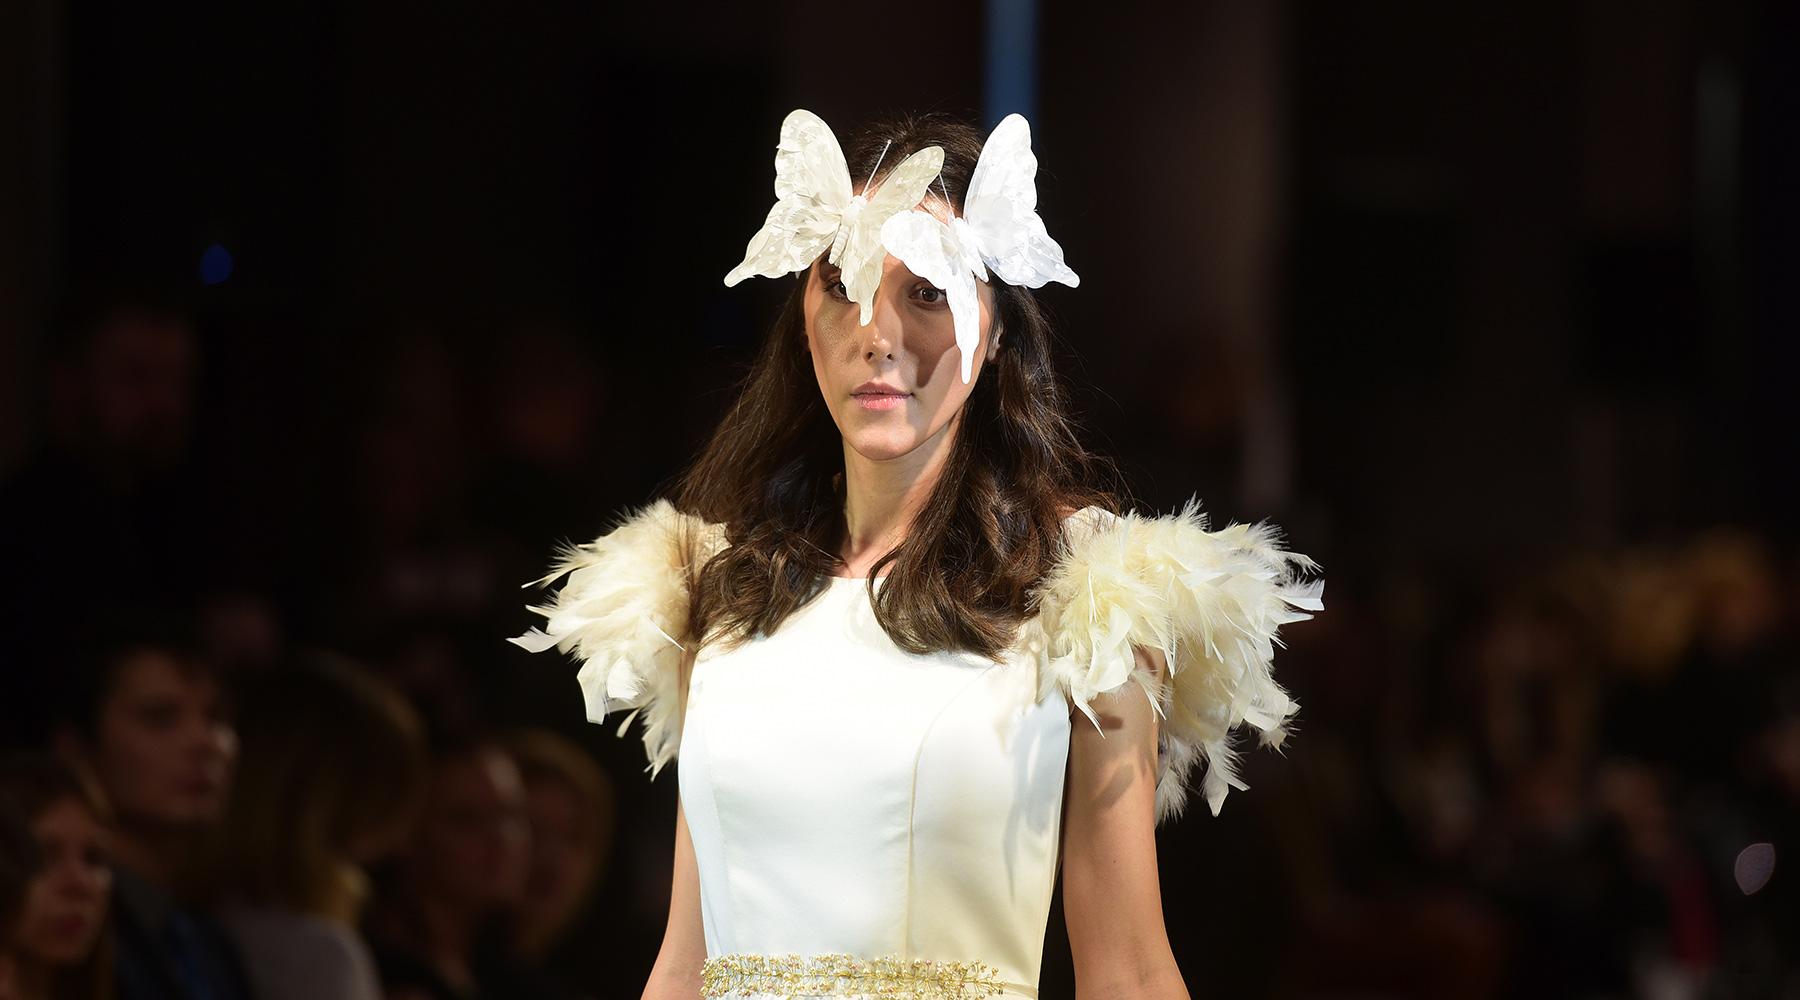 Amelia-wedding-dresses-144